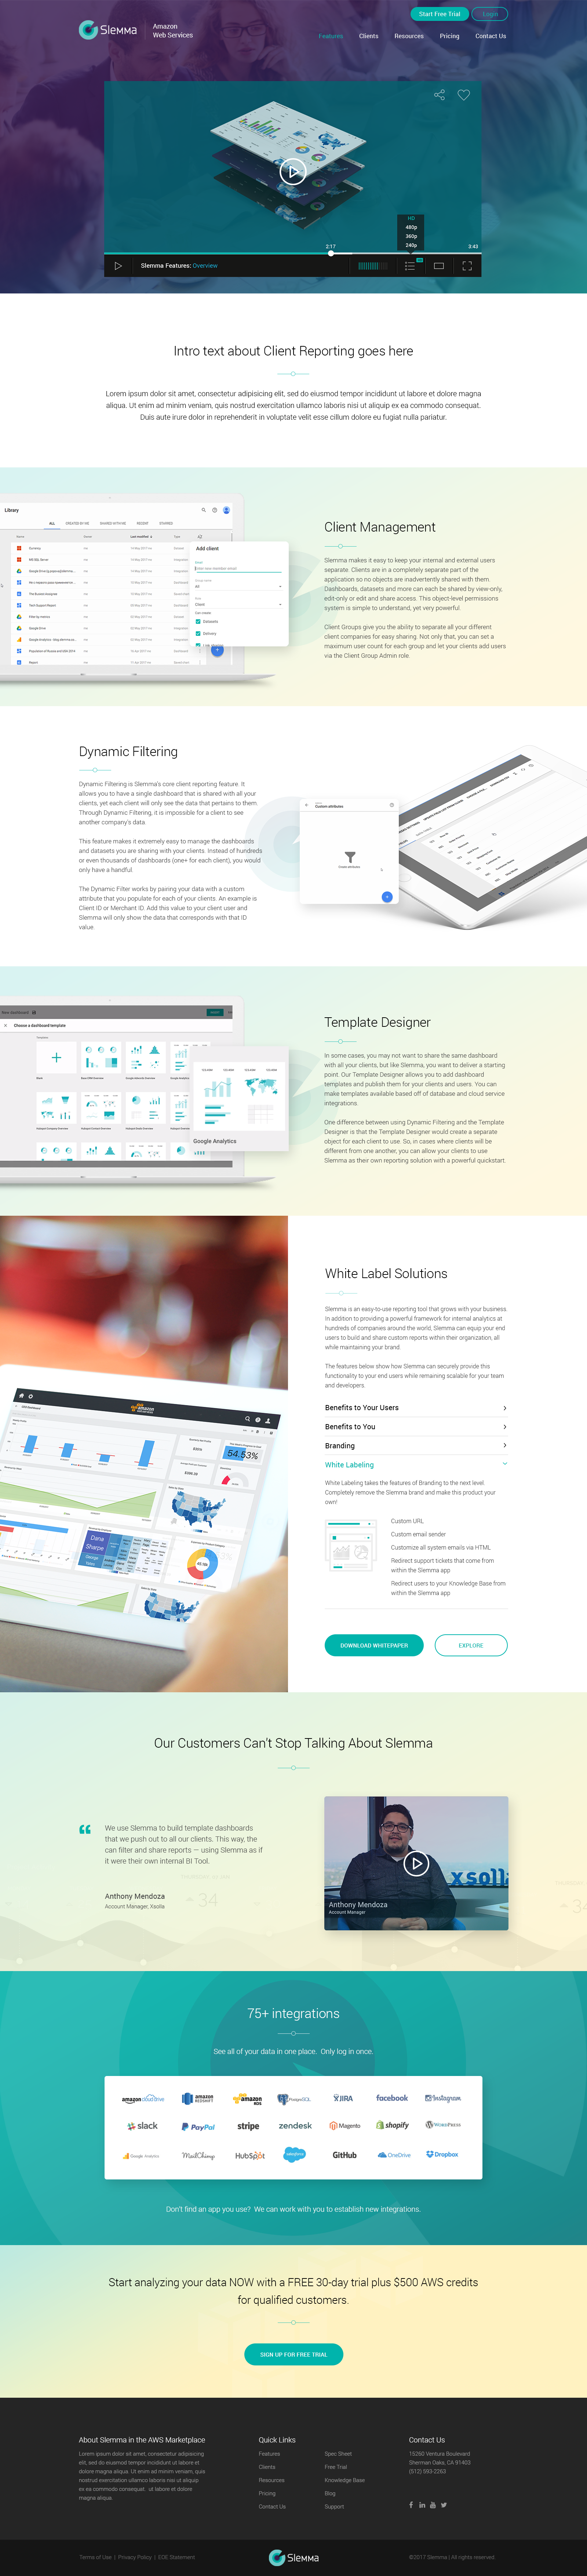 Slemma: AWS Marketplace Microsite